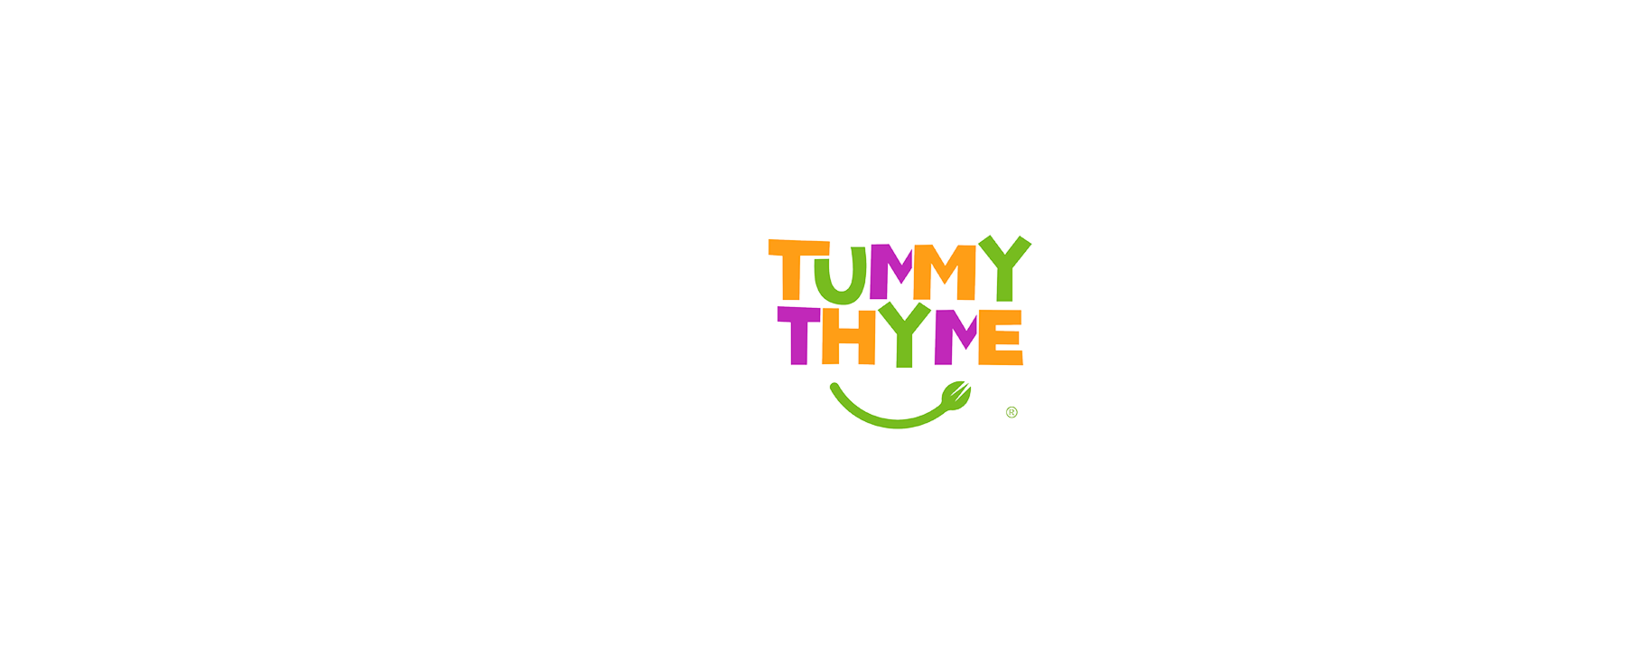 Tummy Thyme Discount Code 2021